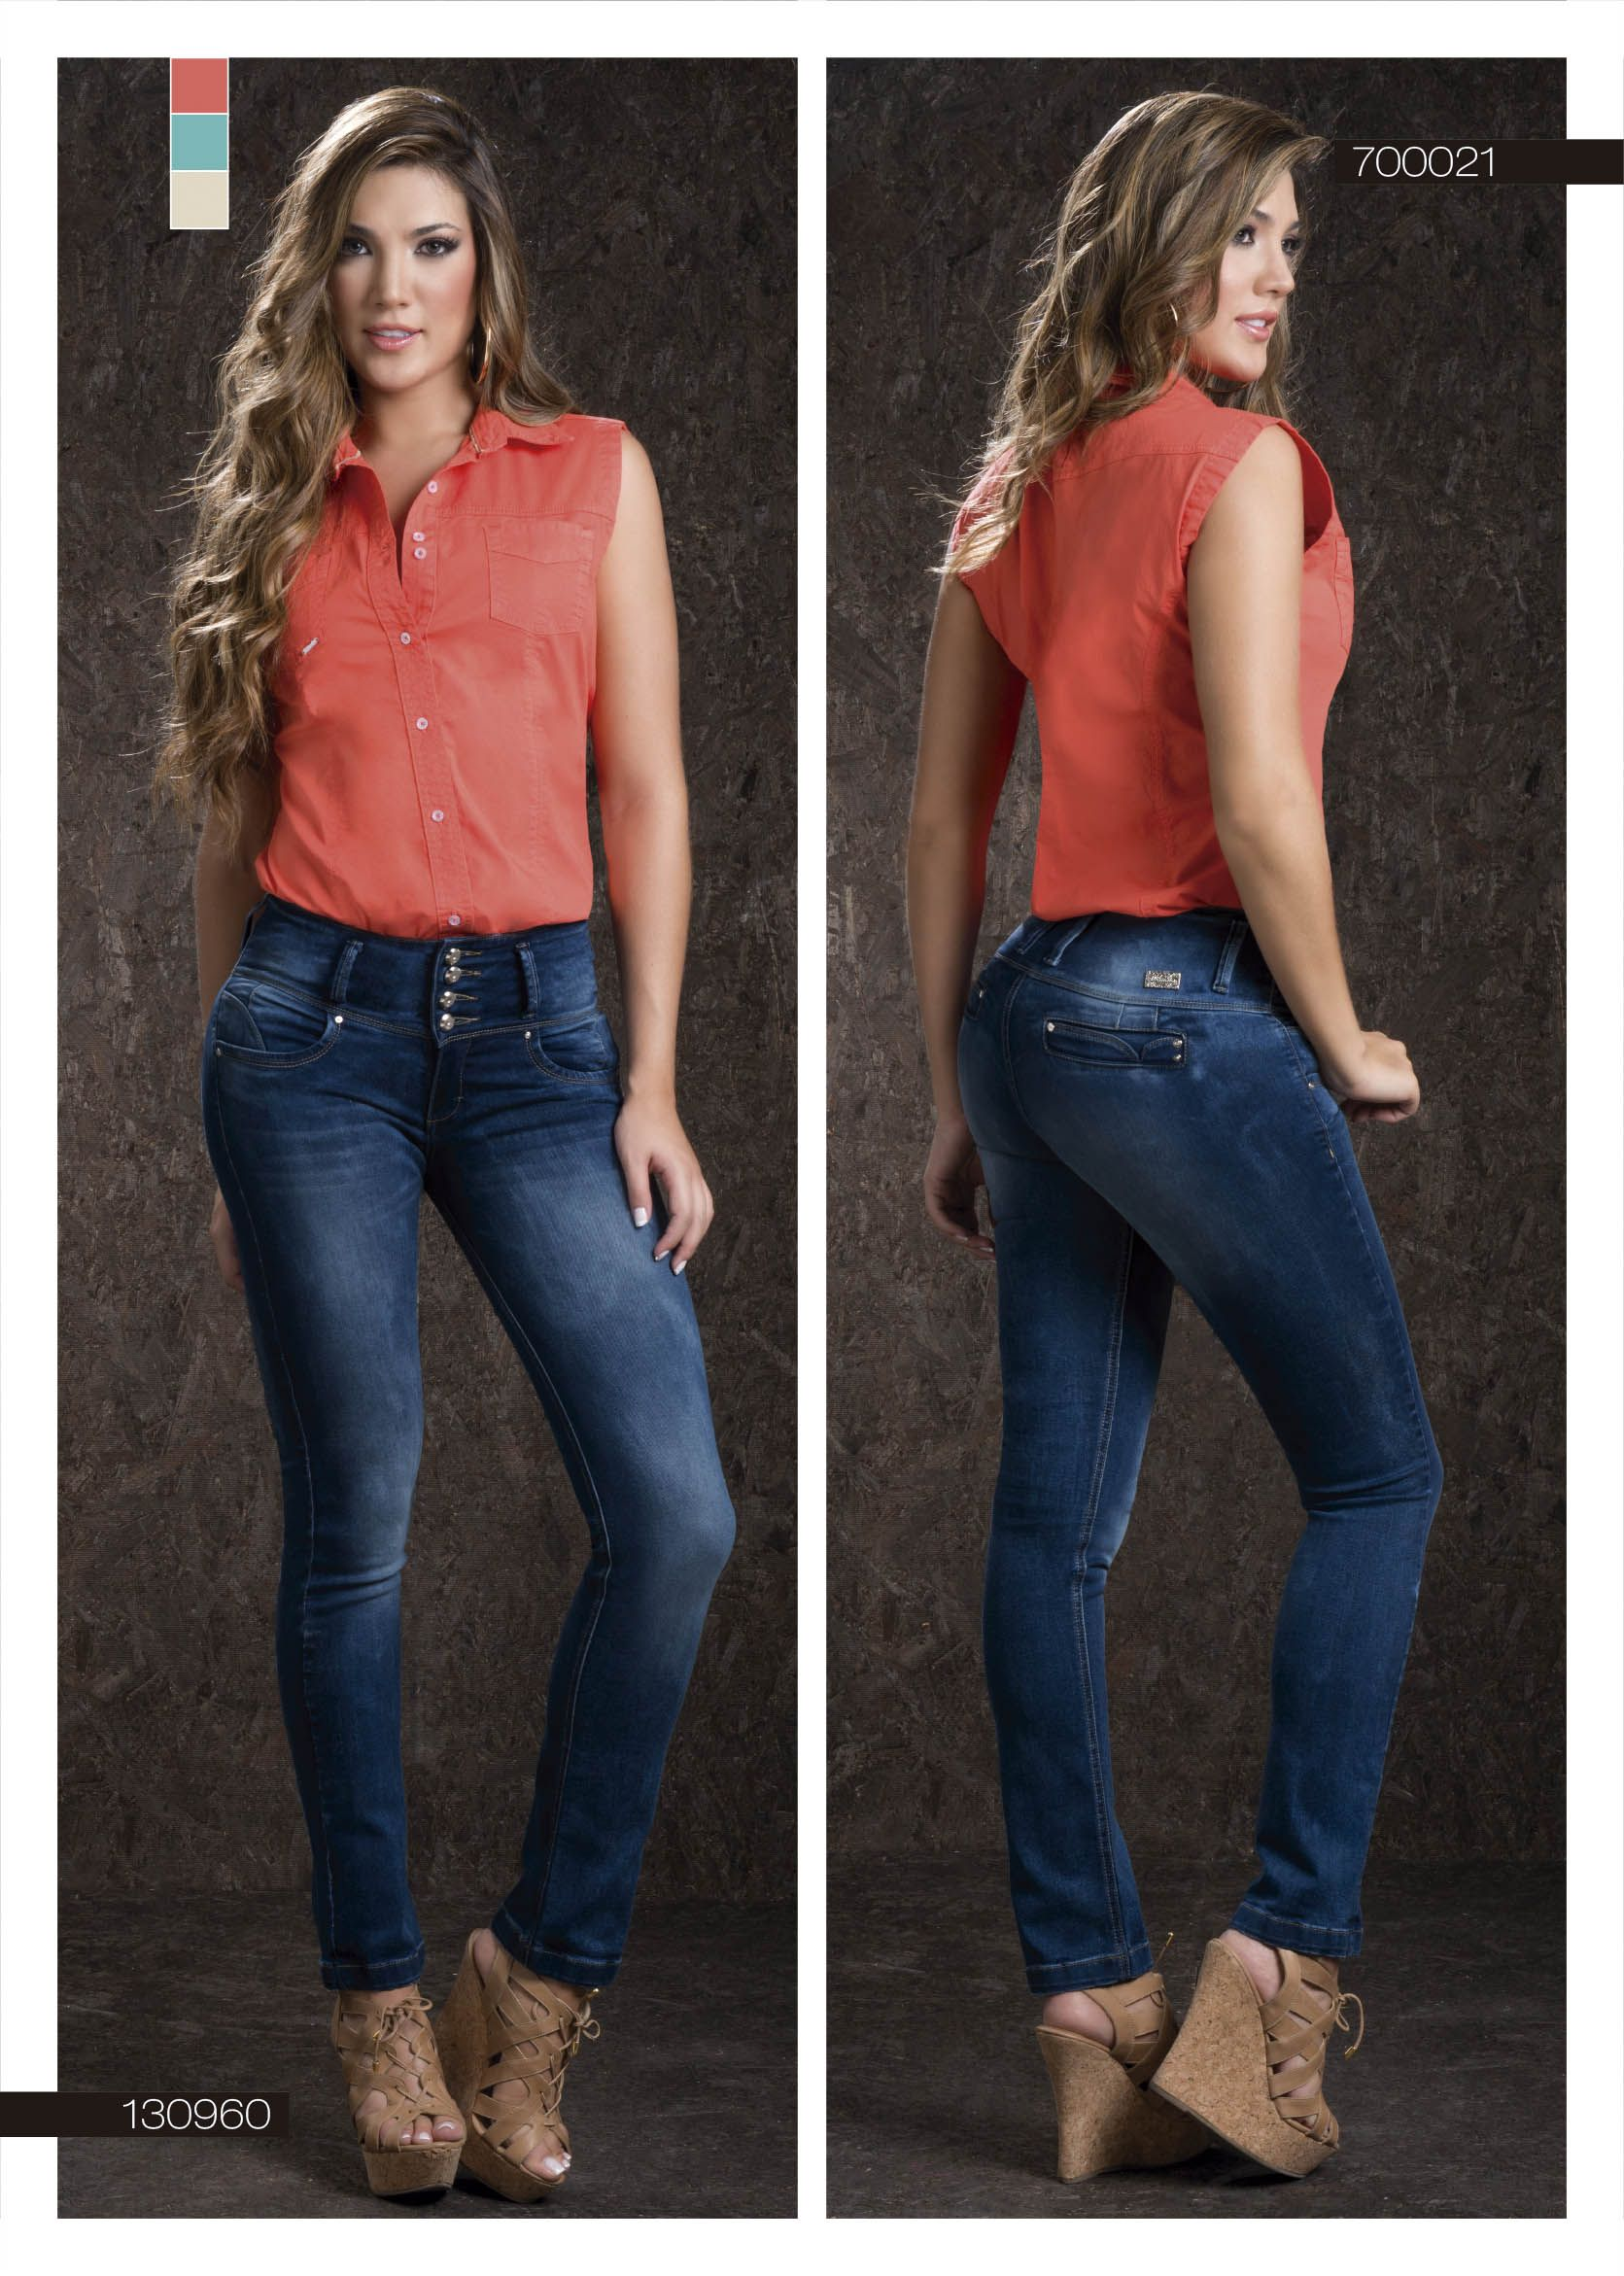 29f6c939d8496 jeans-para-dama-color-azul-bota-recta-blusa-dama-color-naranja- blue-jeans-for-women-  boot-straight- orange-blouse  fashion  women  ropademoda